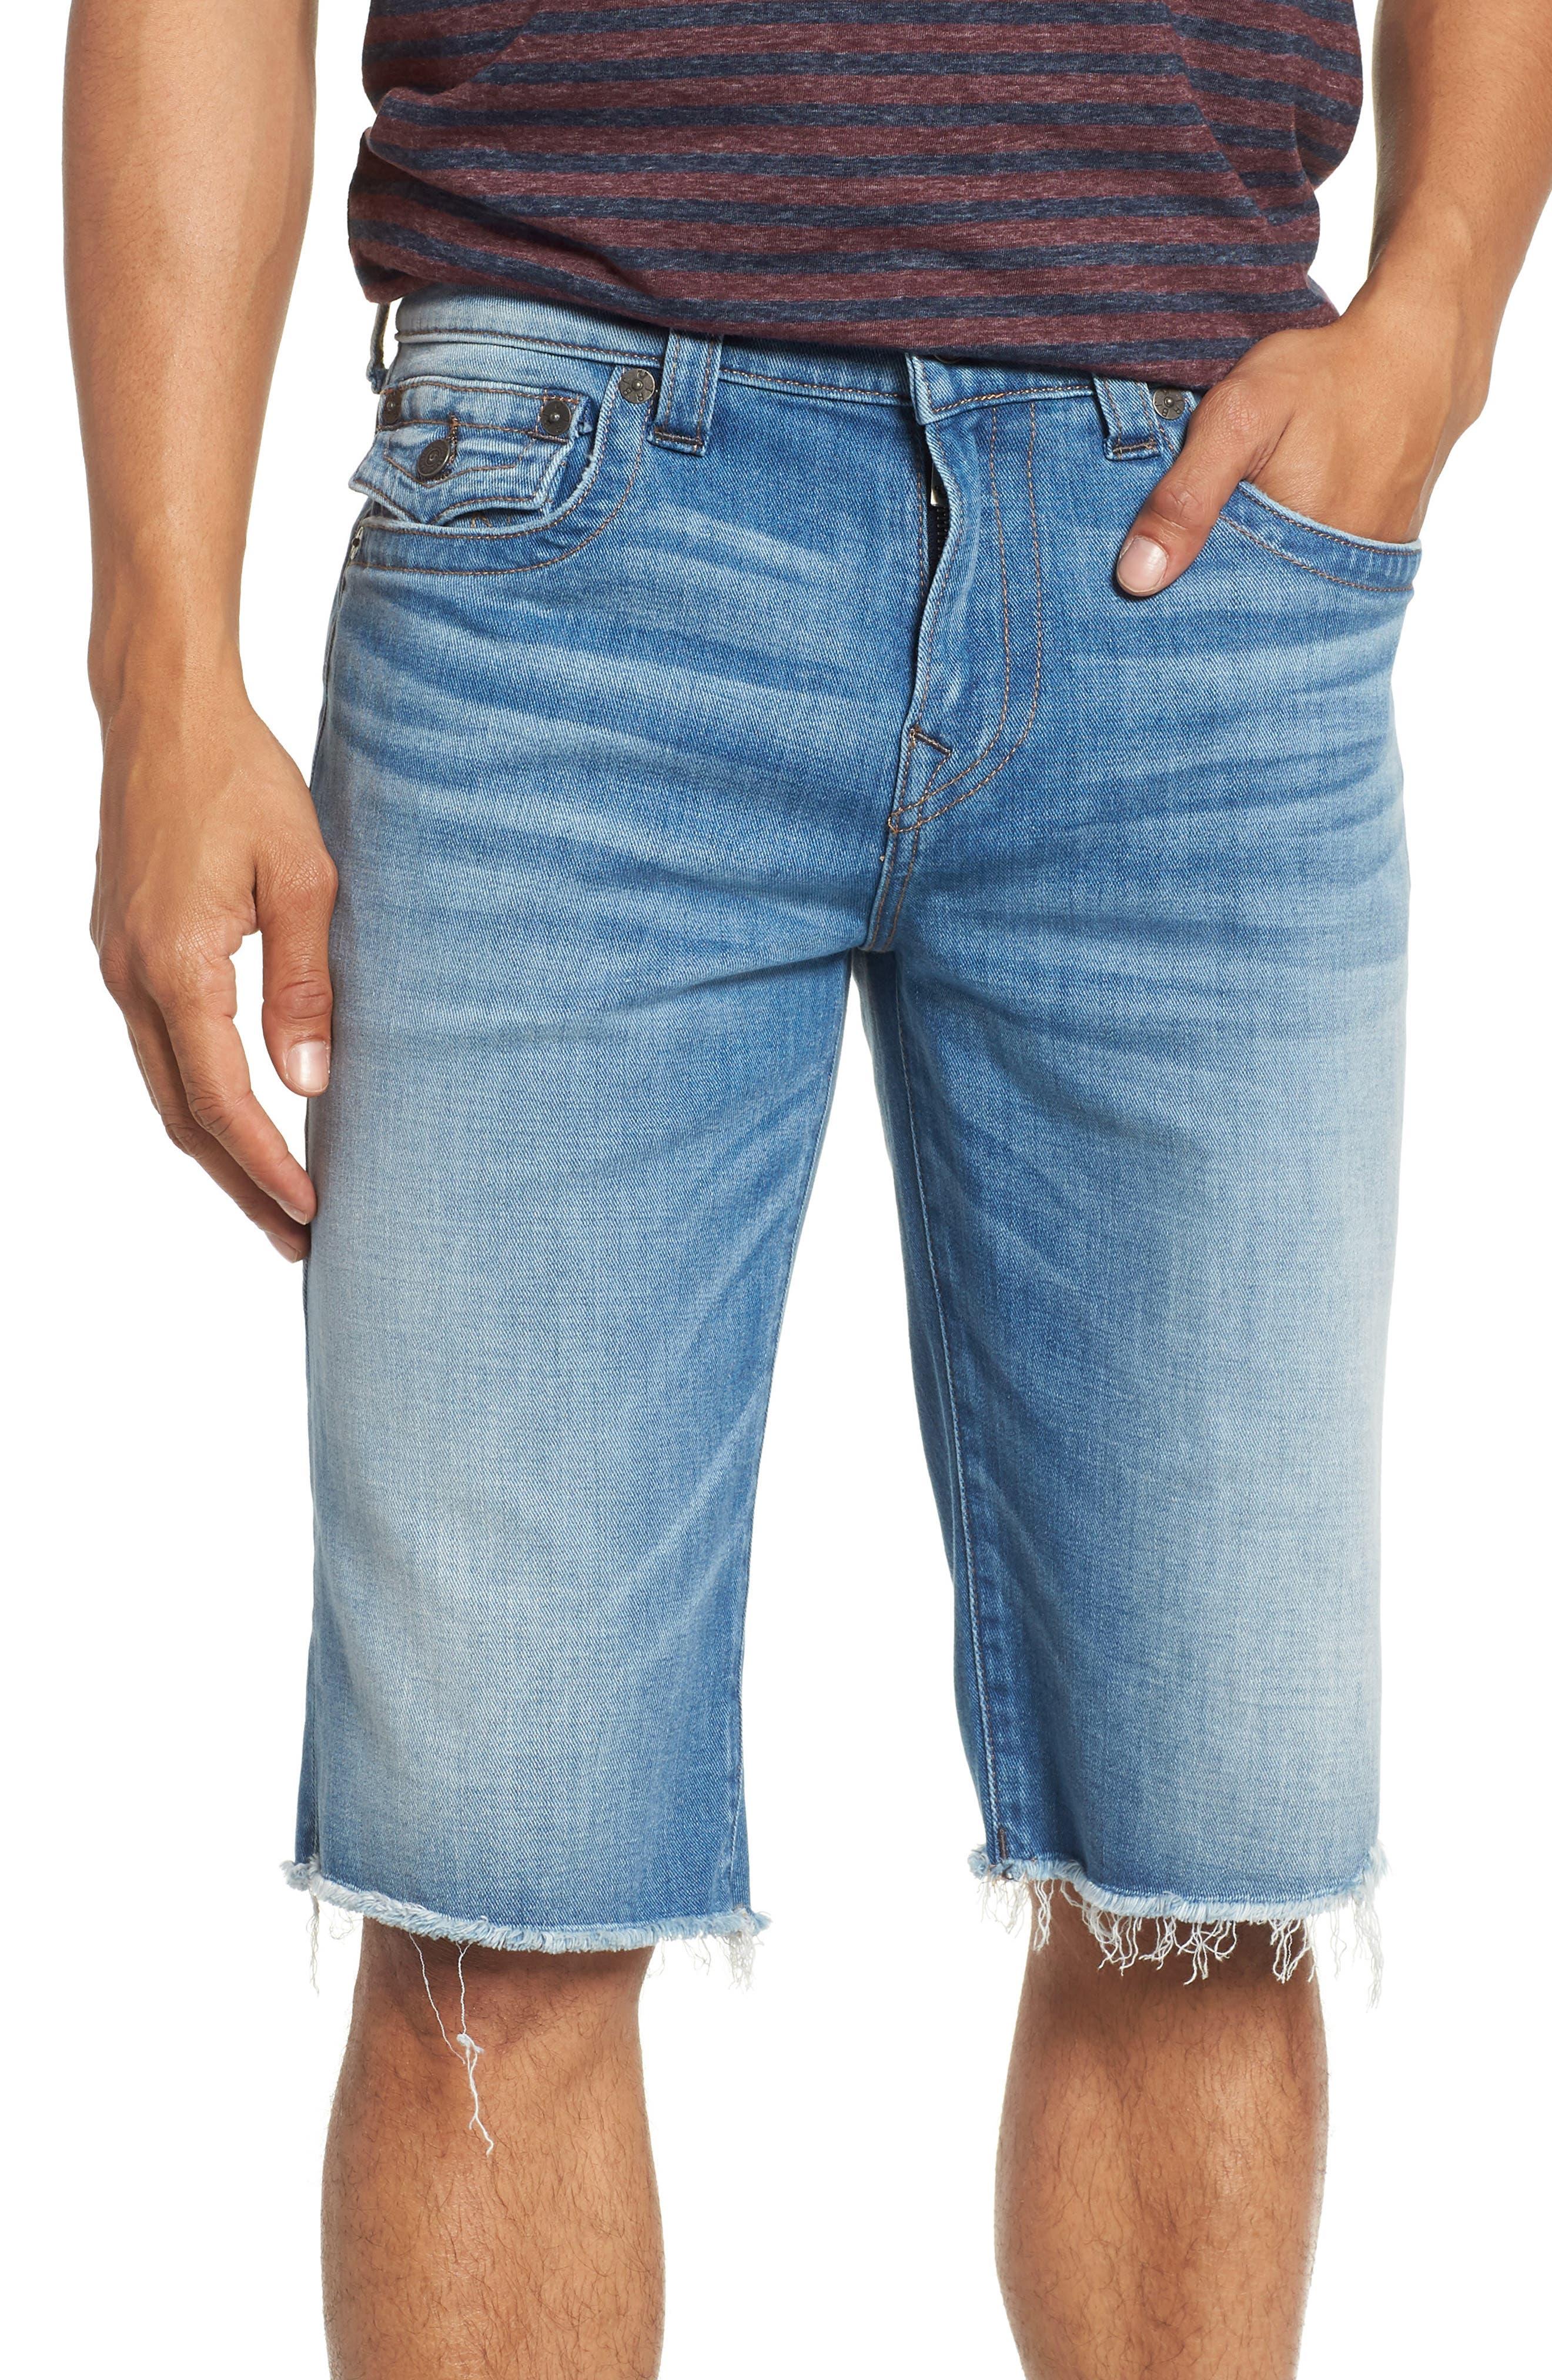 True Religion Brand Jeans Ricky Flap Pocket Shorts